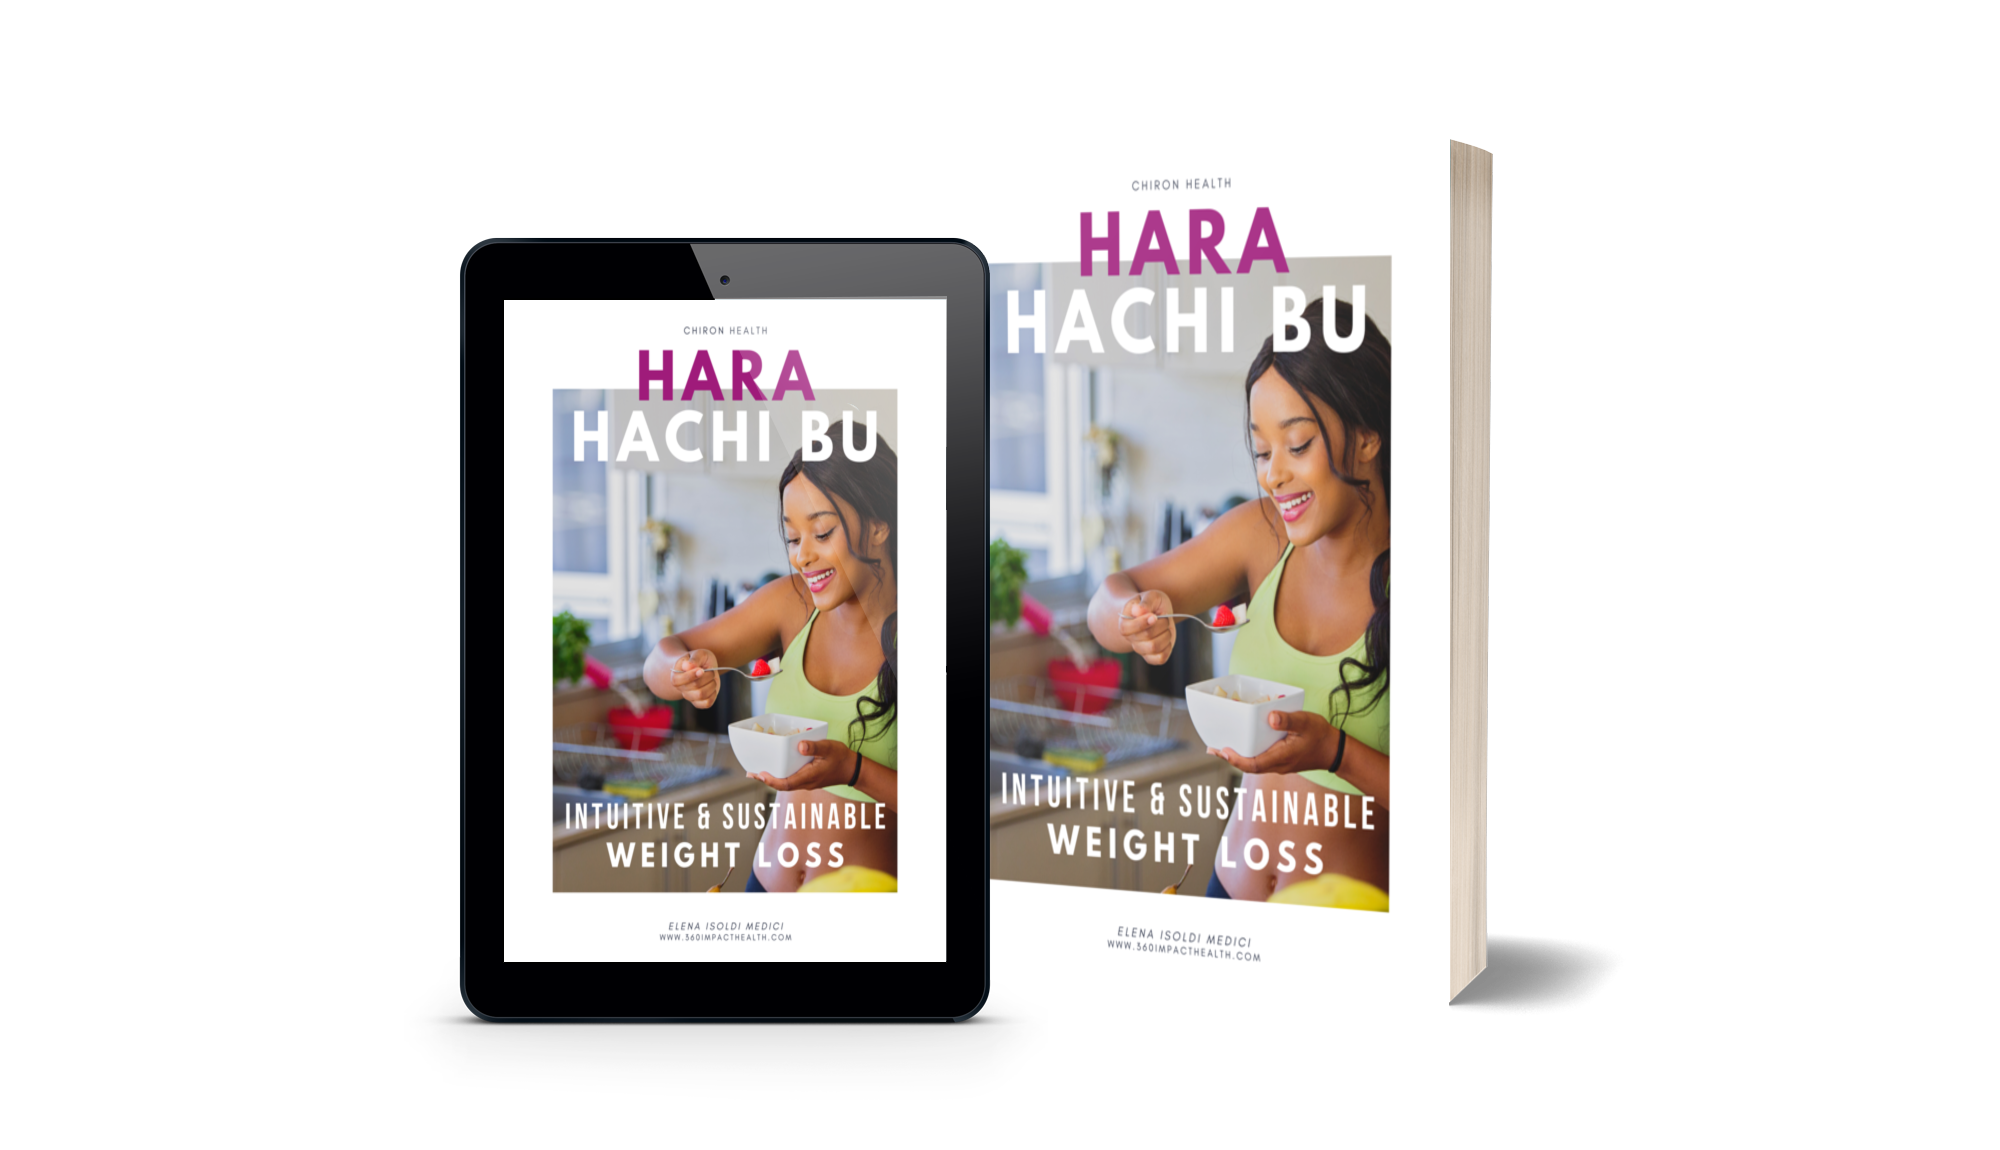 how to practice hara hachi bu